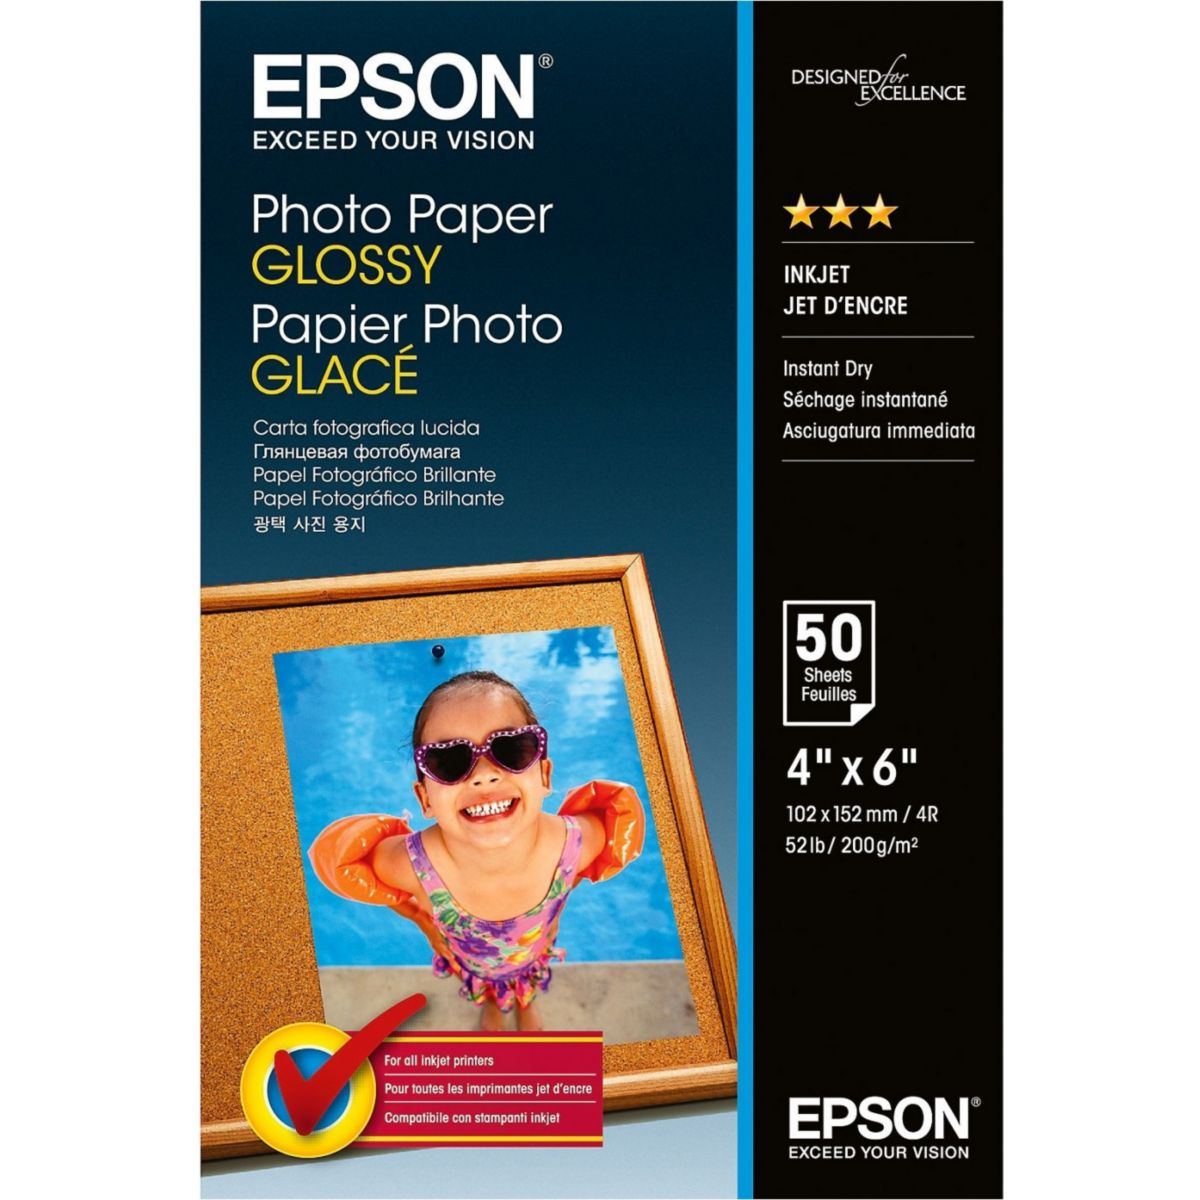 Papier photo epson glac� 200g 10x15 50feuilles (photo)